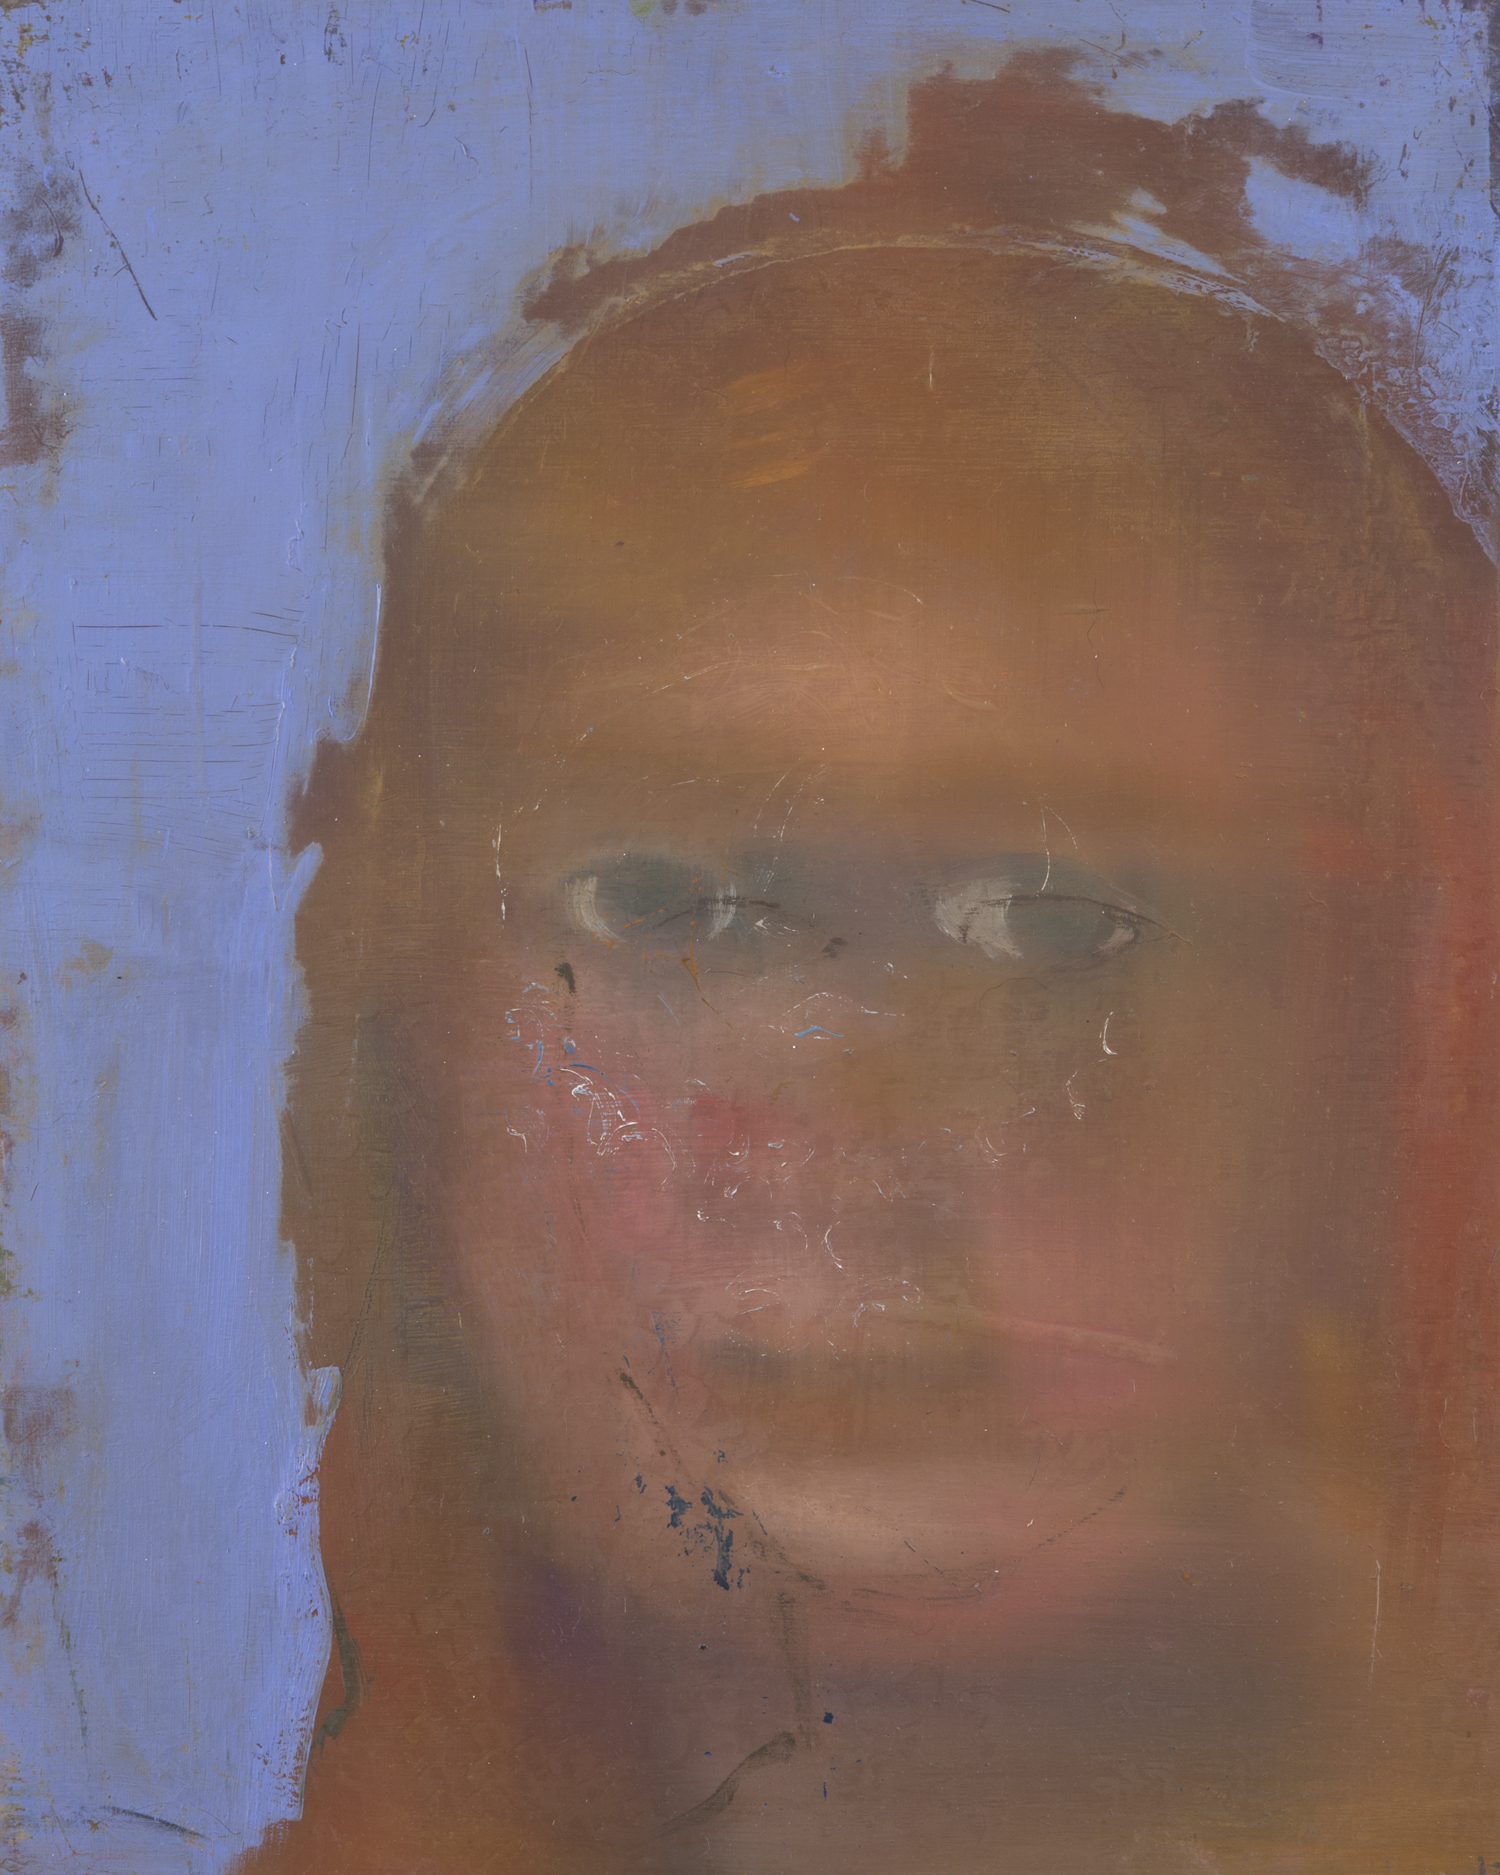 Josepha de Castilla close-up (after Goya), 2013